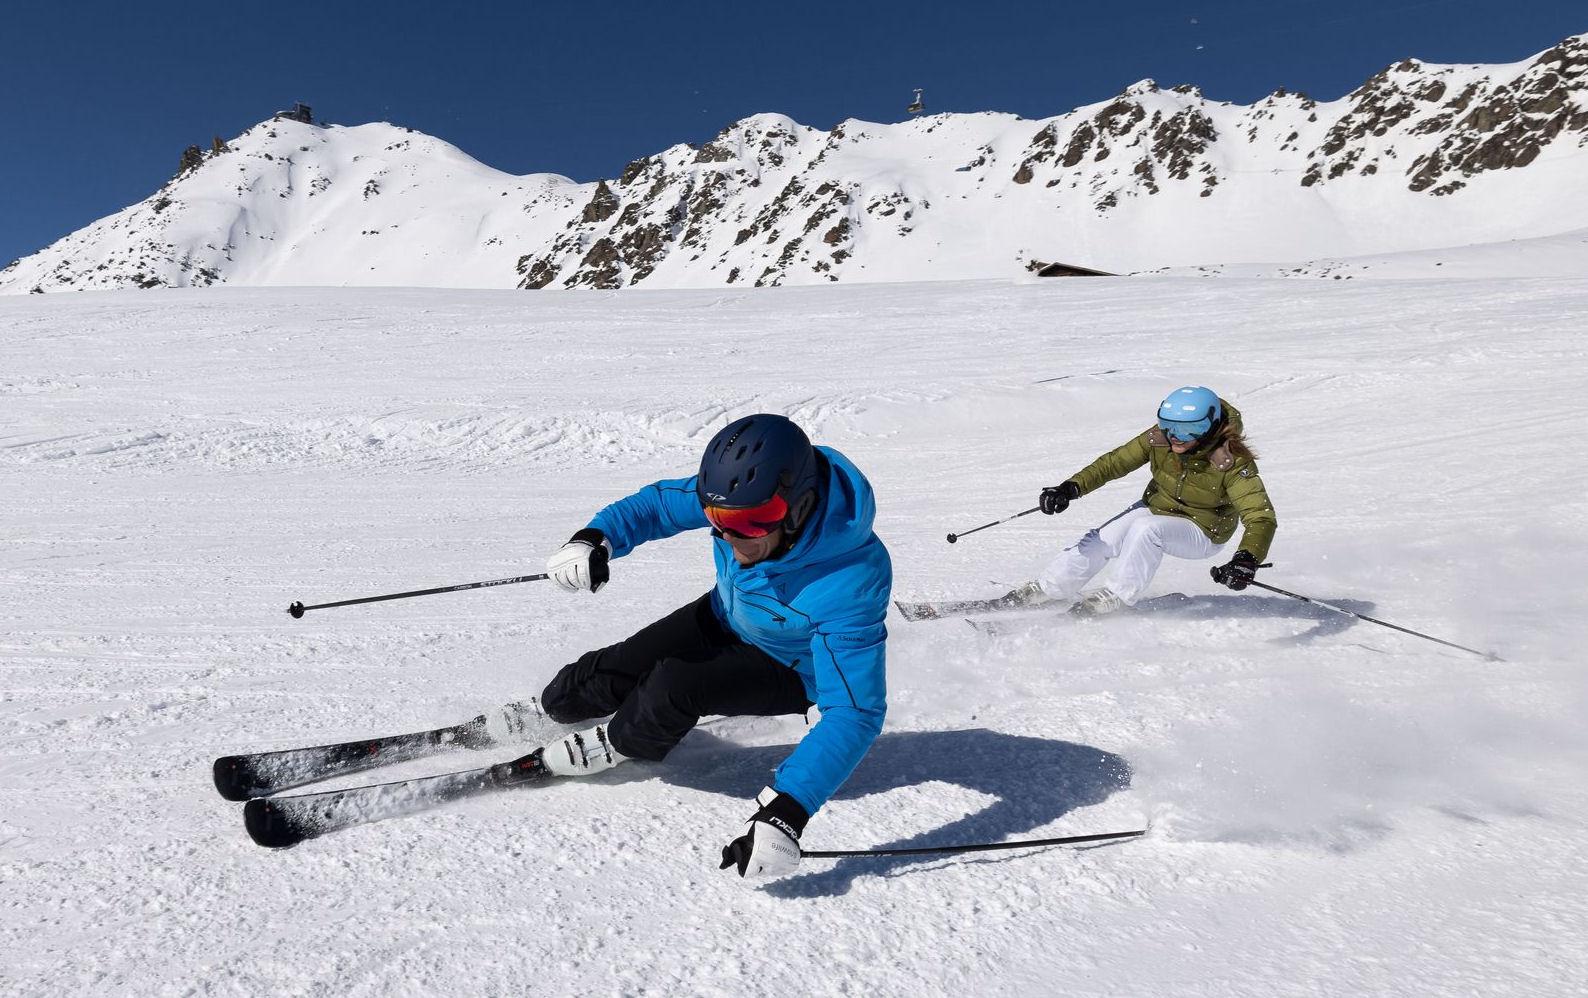 cp corao+ en carachillo skihelm actiefoto